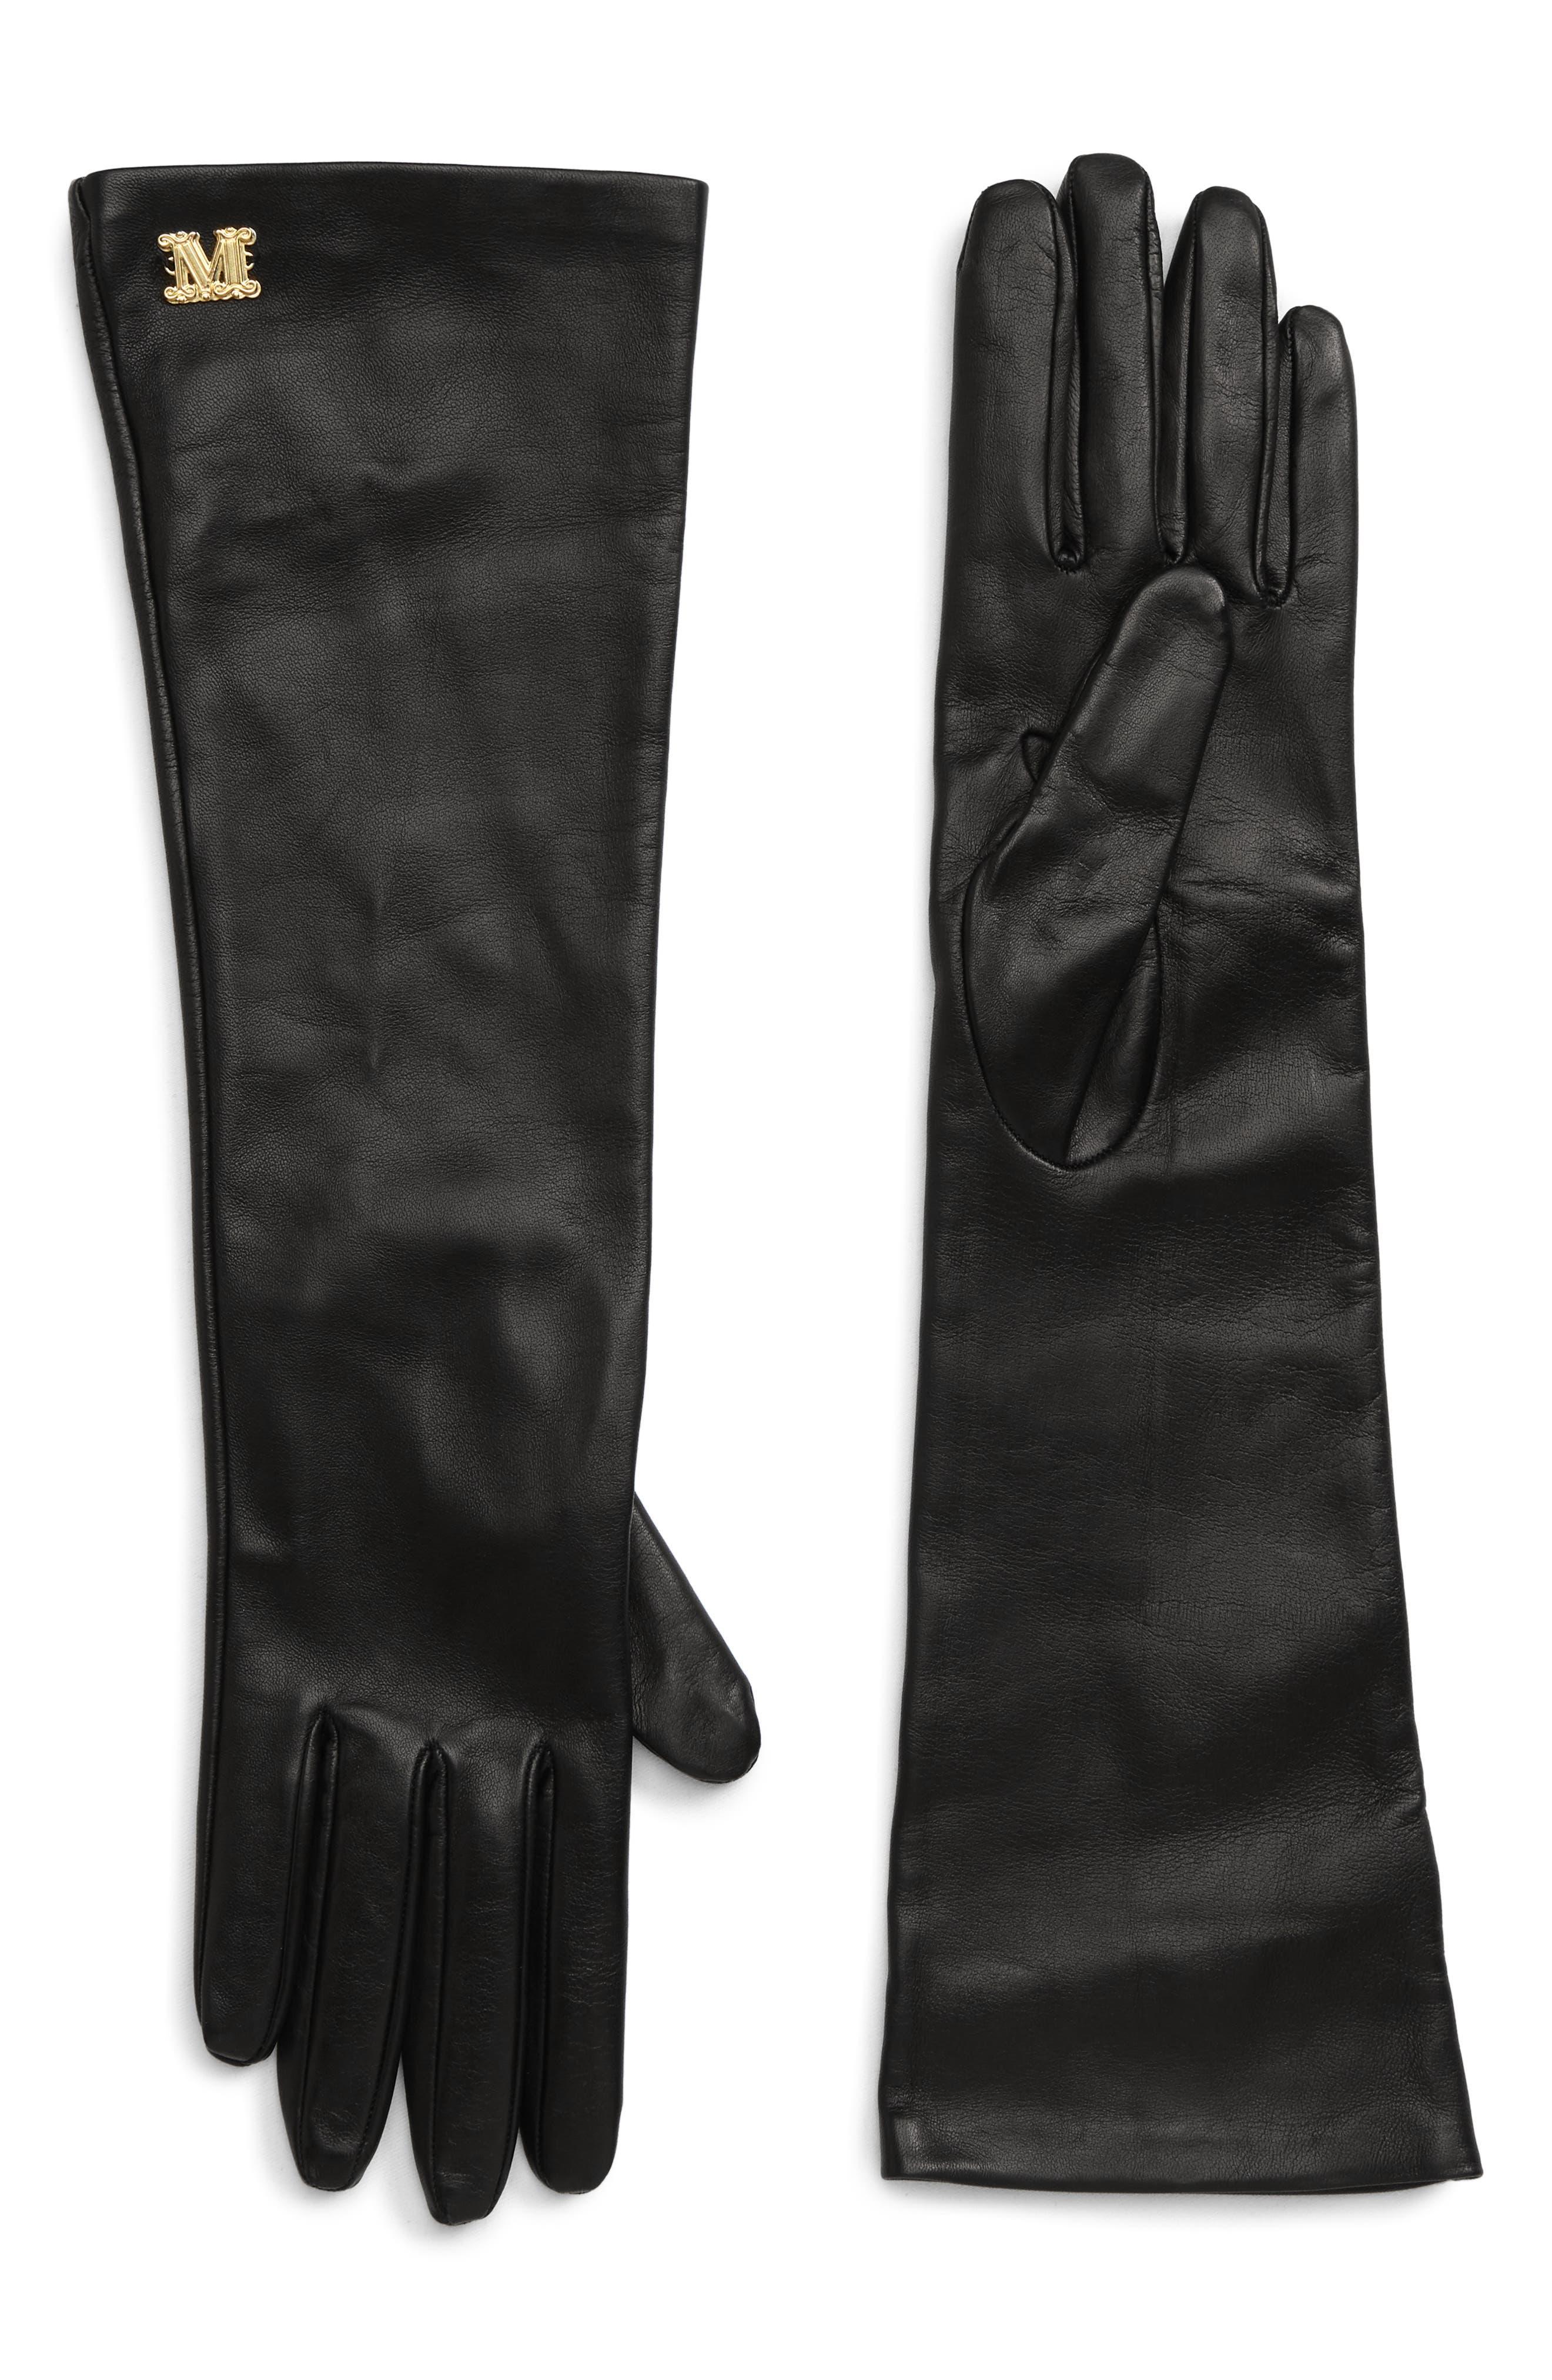 7efa785c8d461 Women s Gloves   Mittens